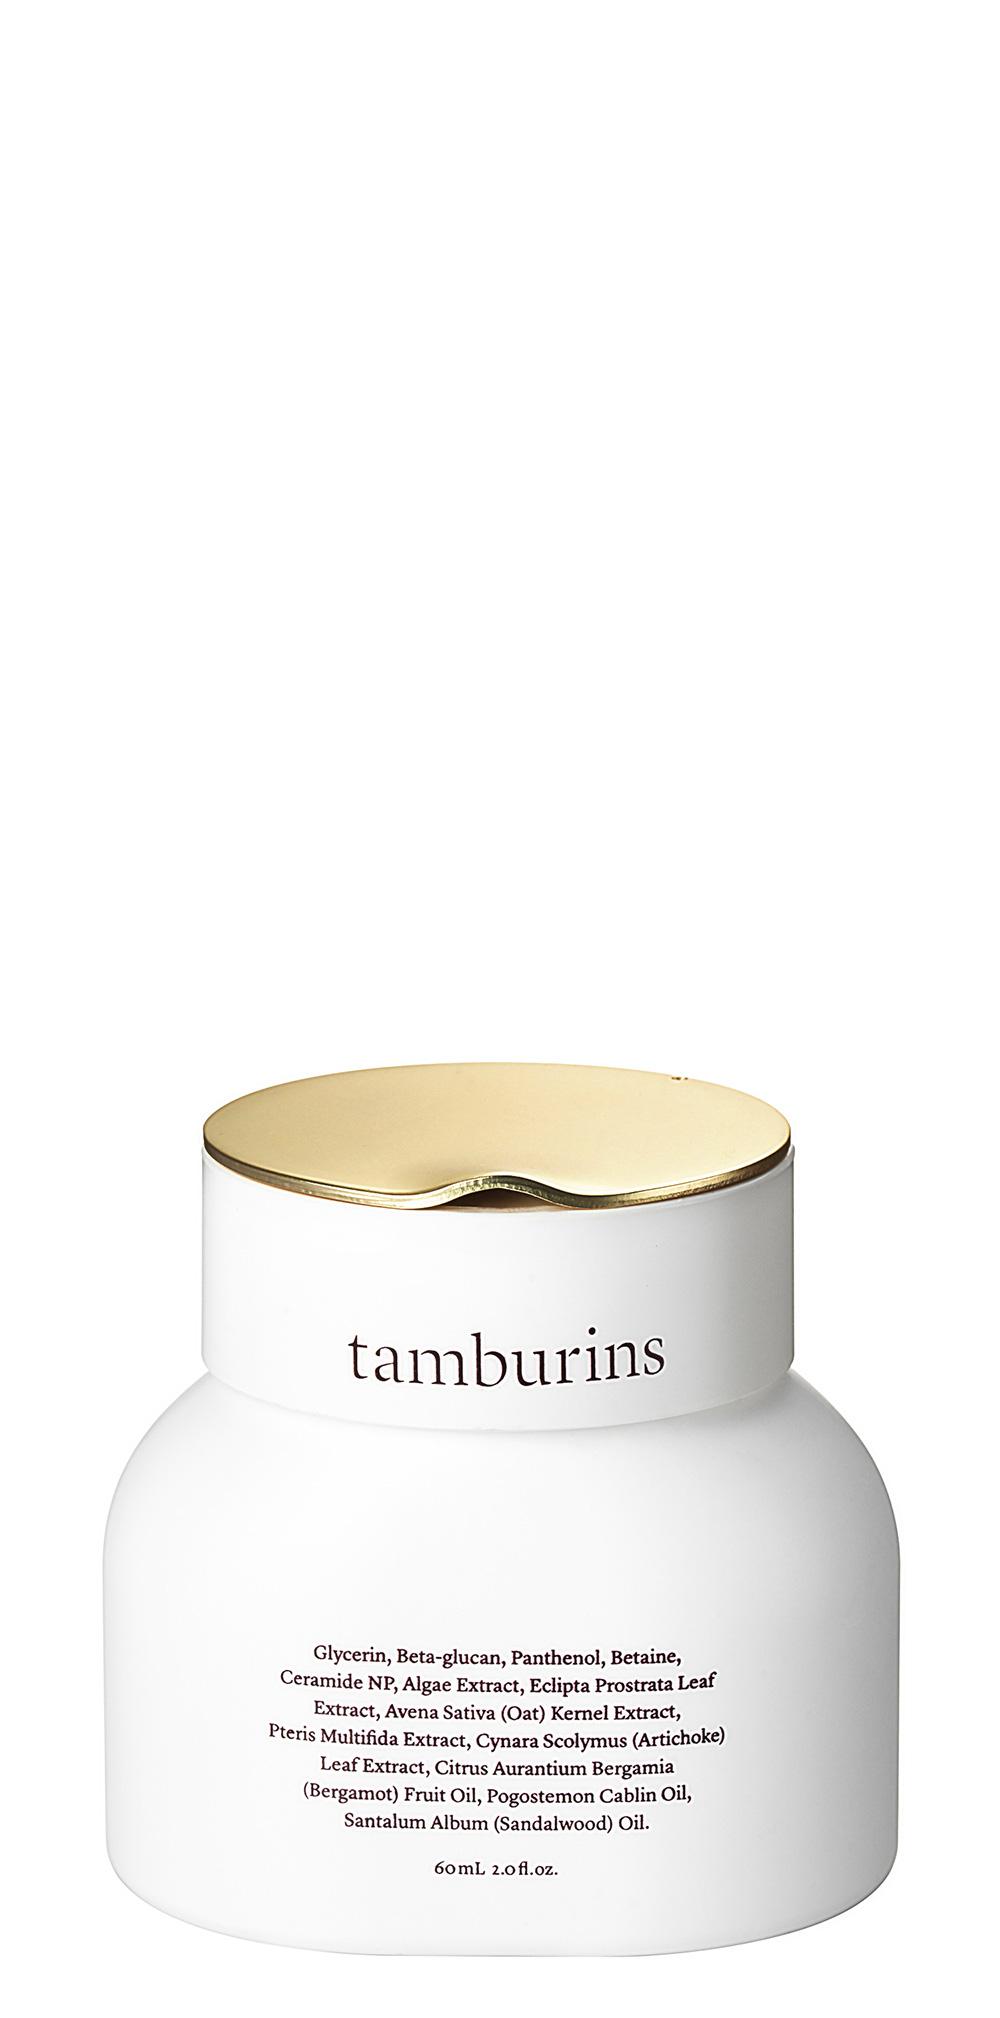 tamburins | 댄스인핸스 페이셜 재생크림